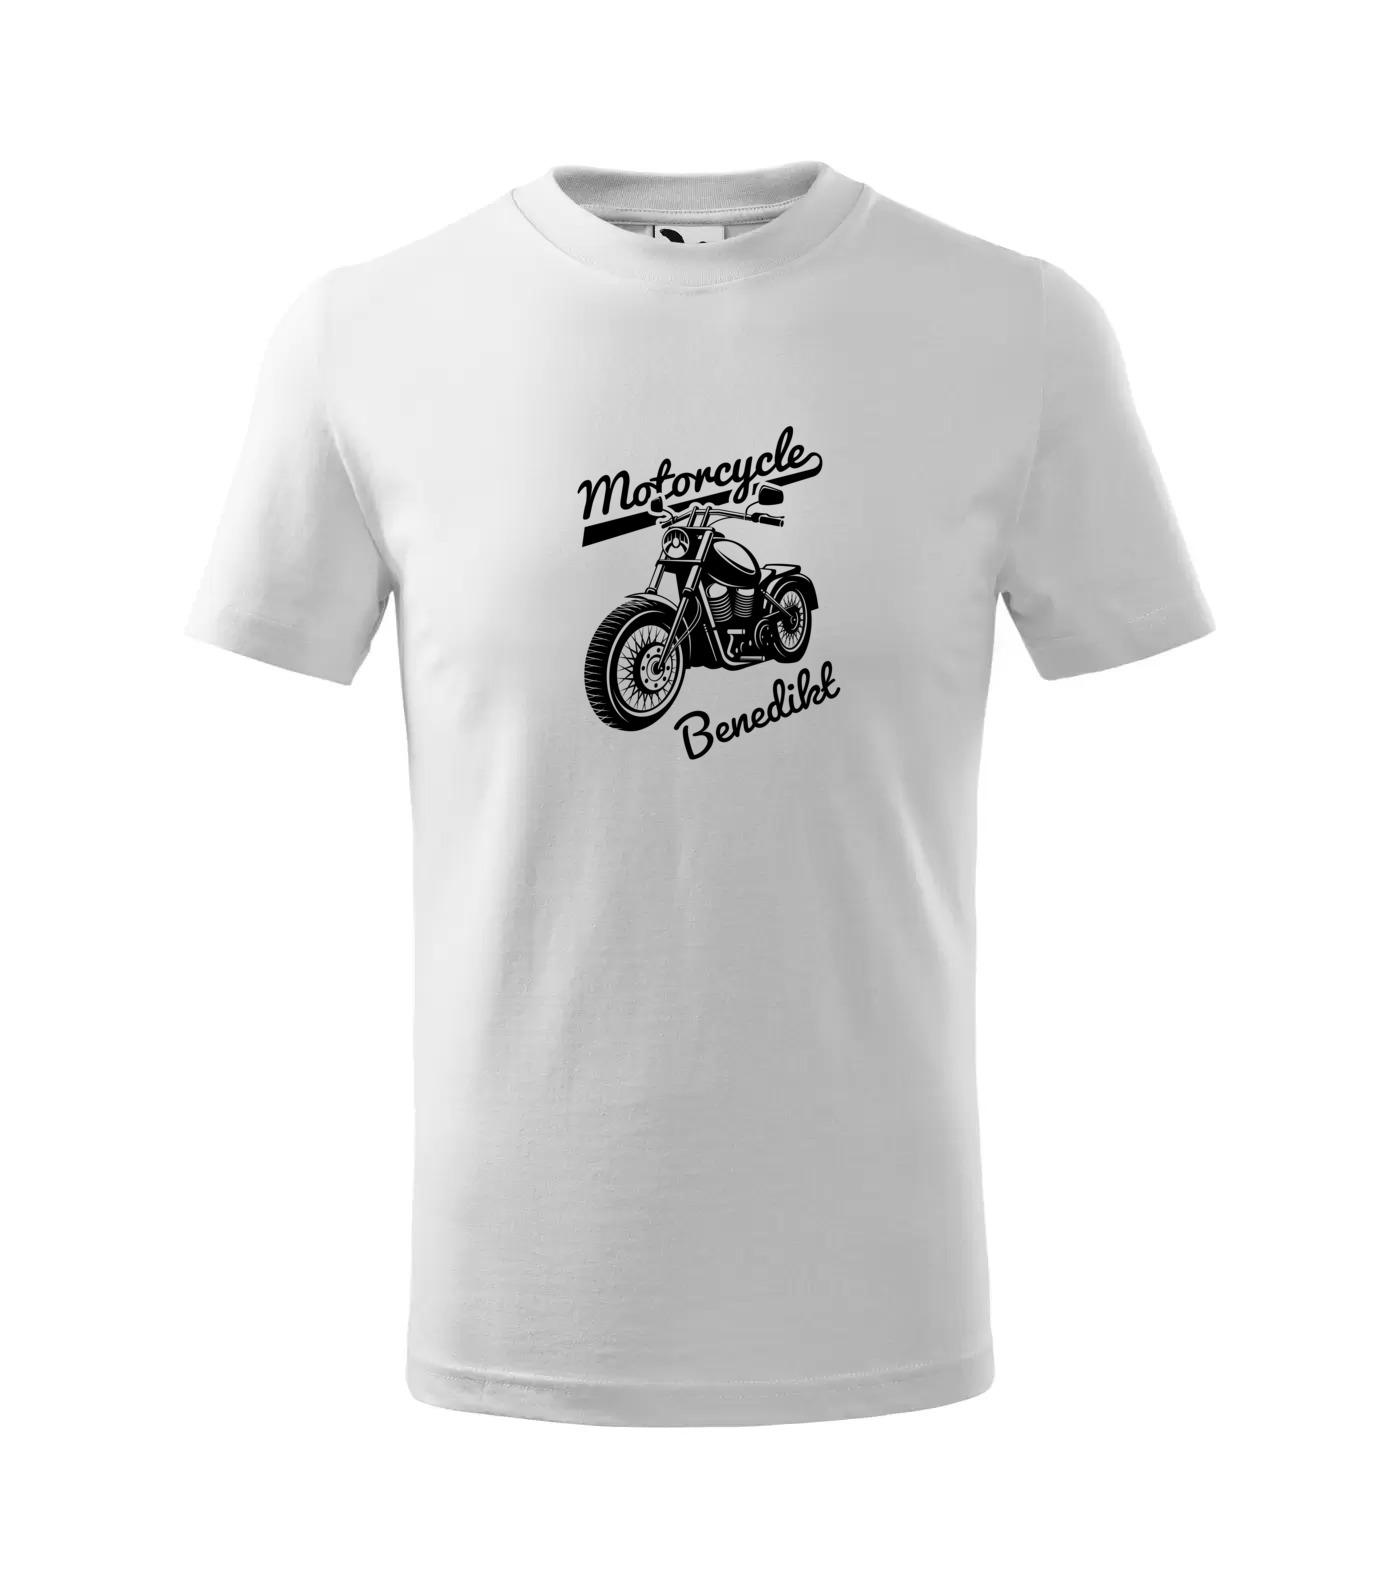 Tričko Motorkář Inverse Benedikt